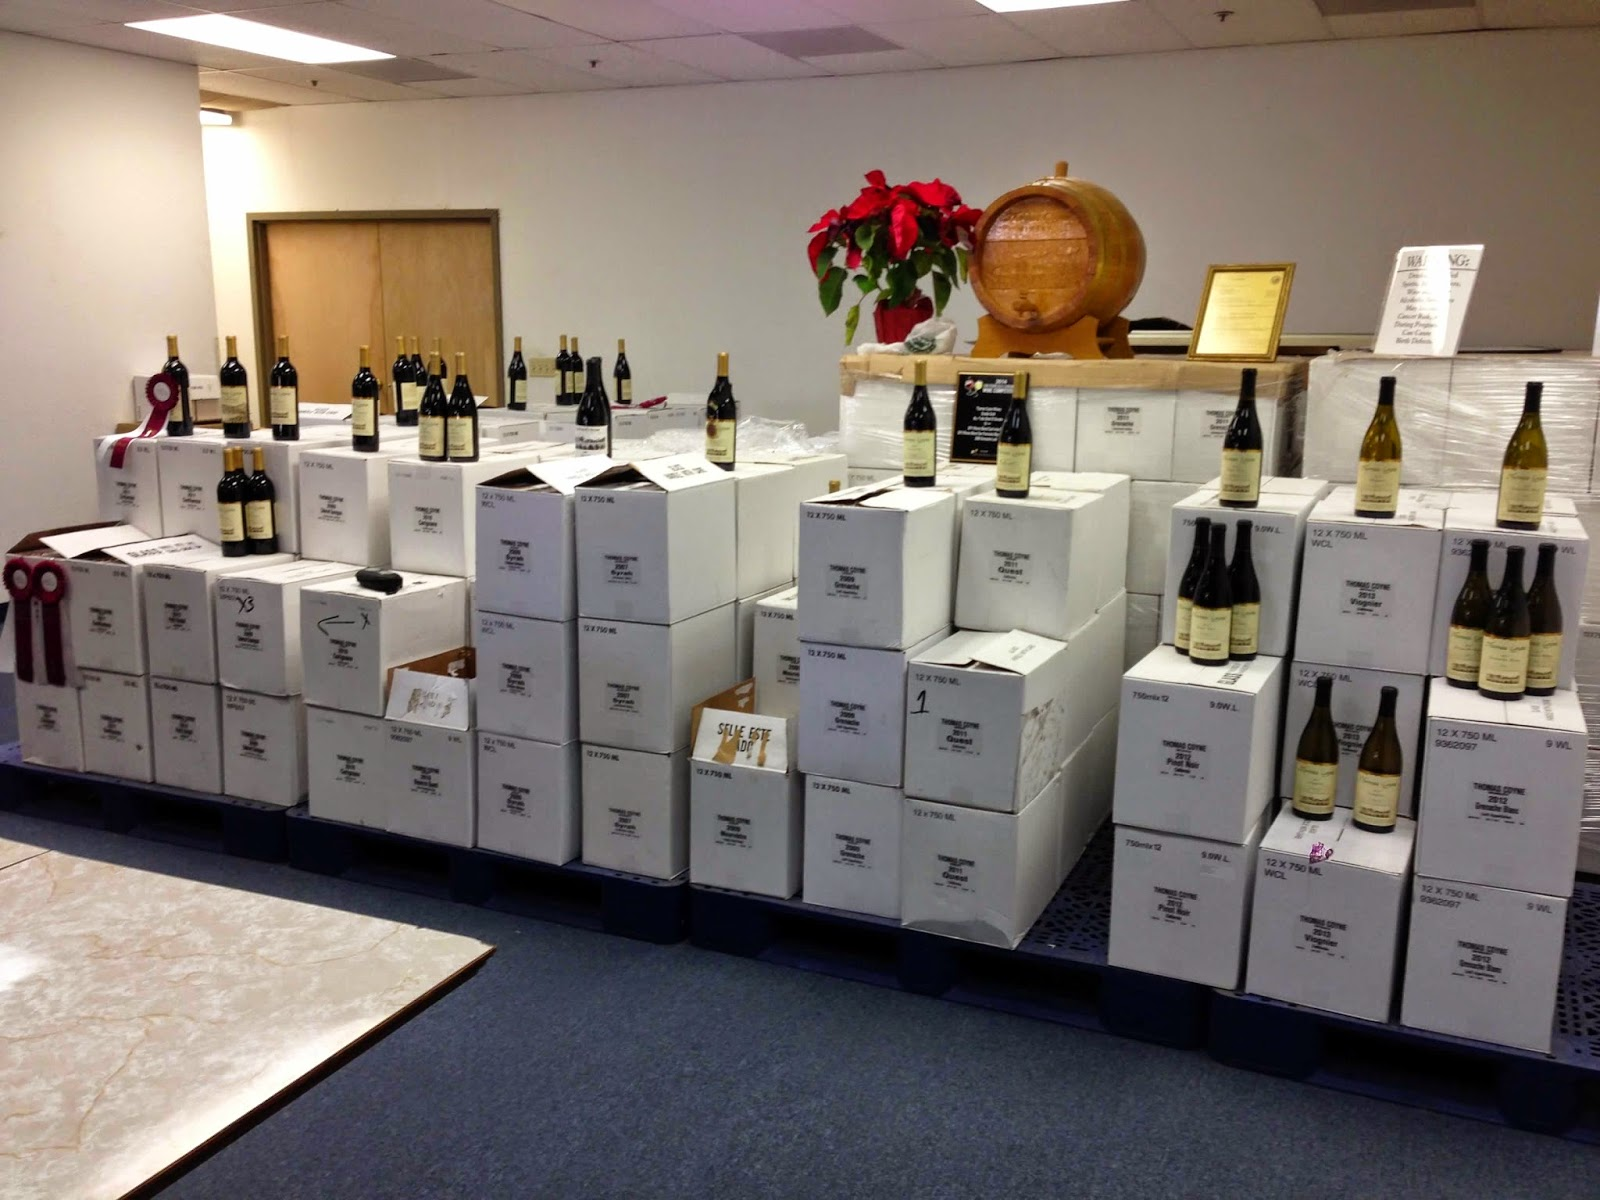 The Thomas Coyne Winery